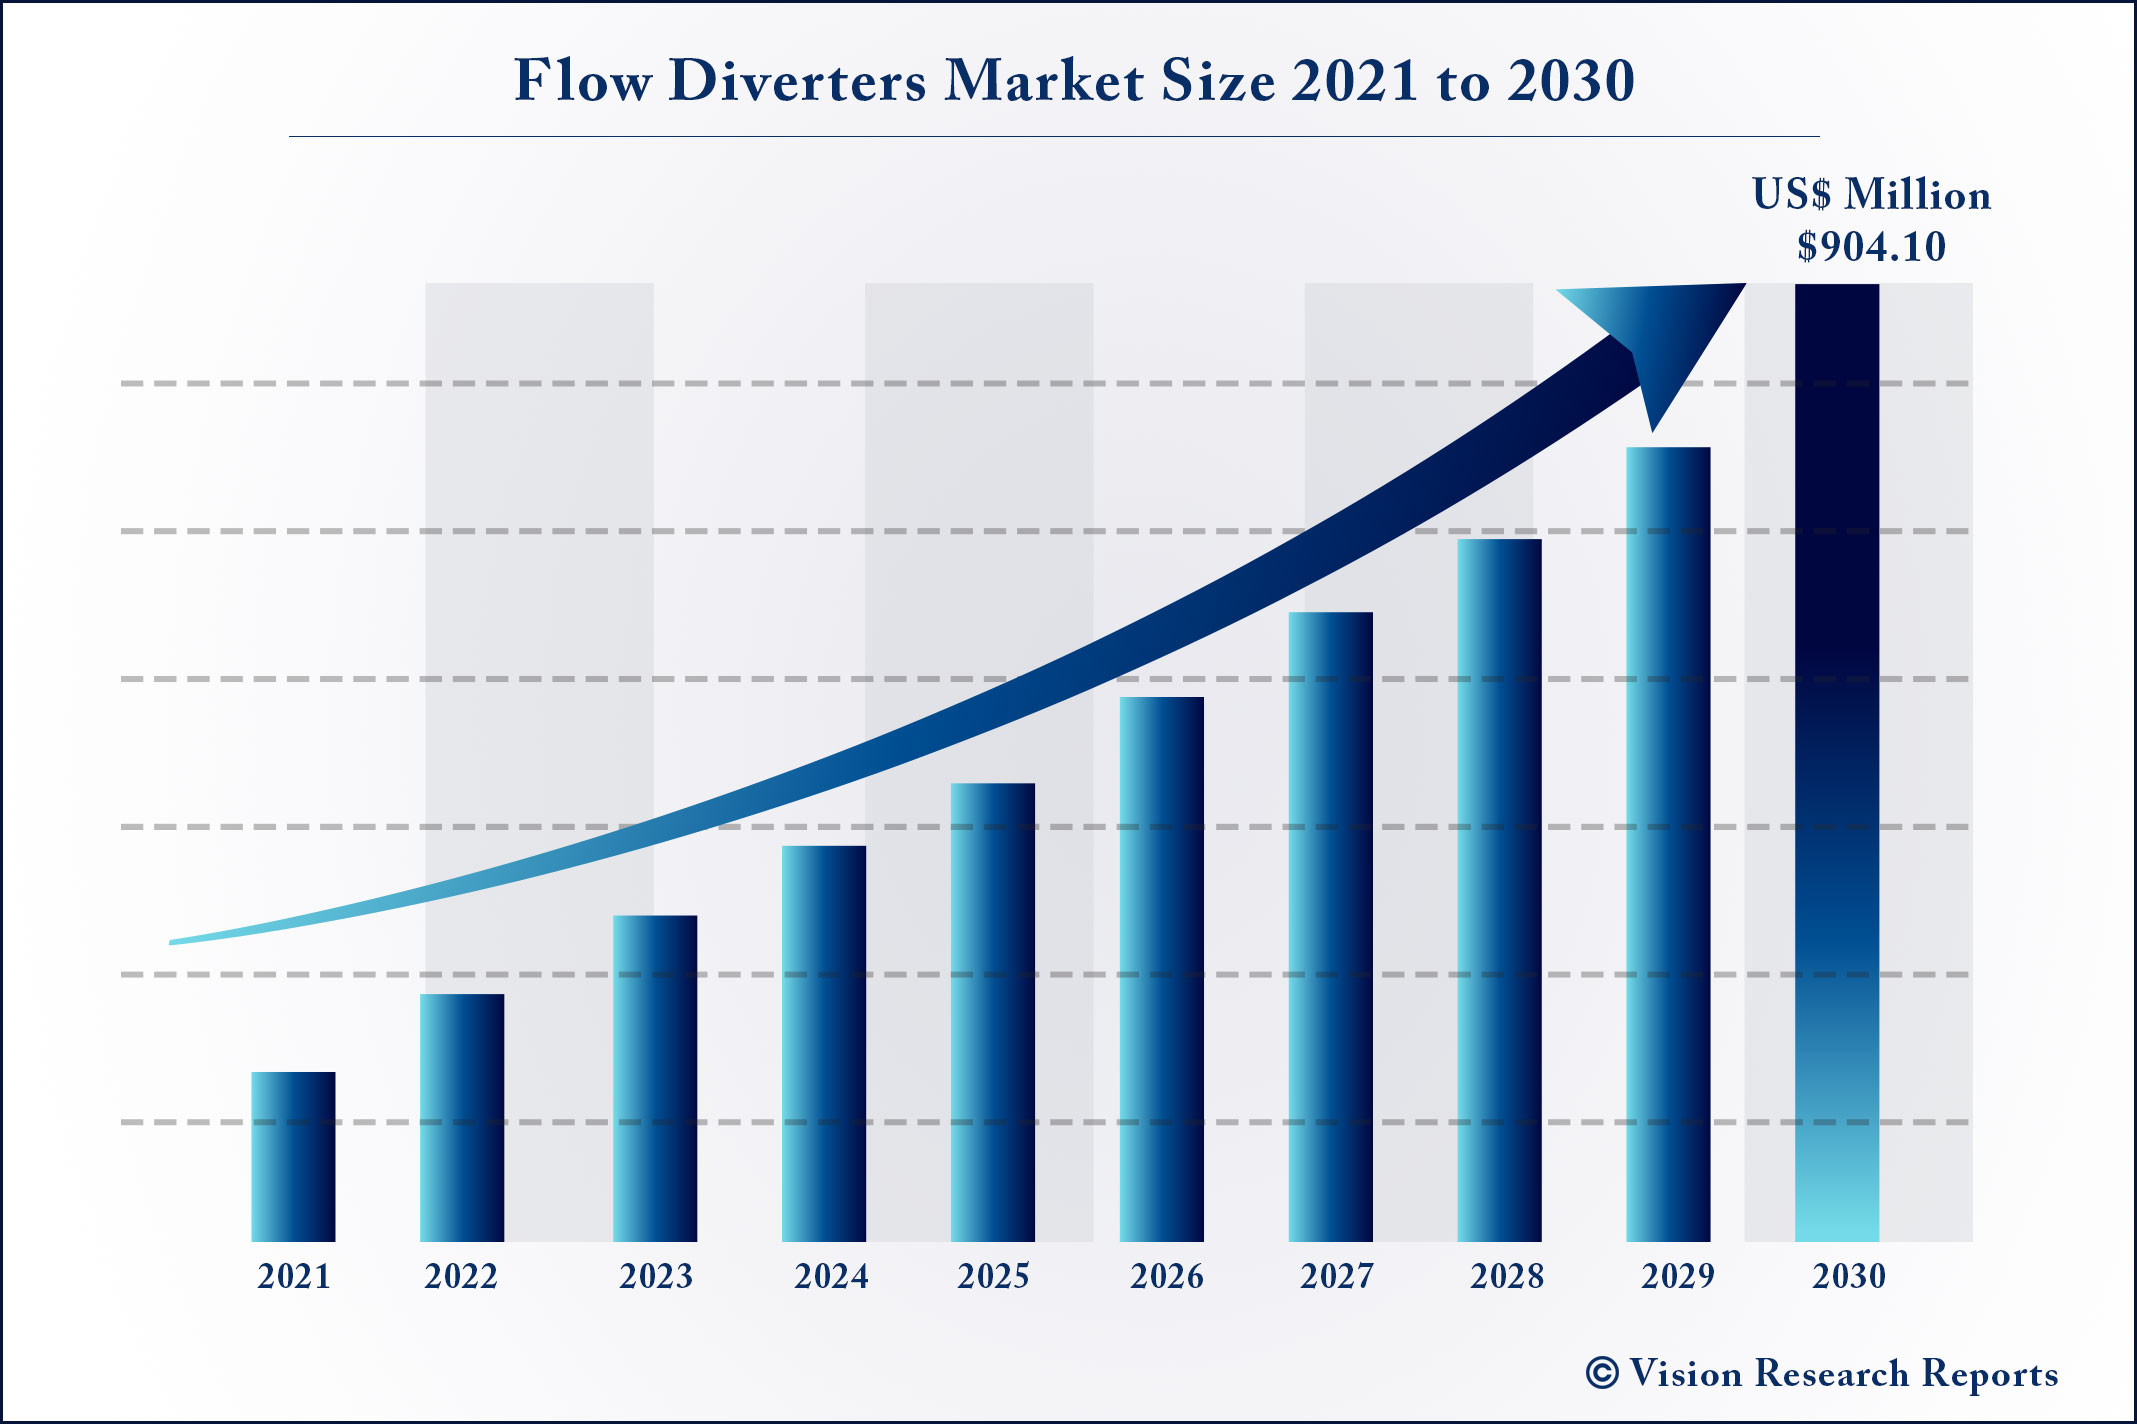 Flow Diverters Market Size 2021 to 2030